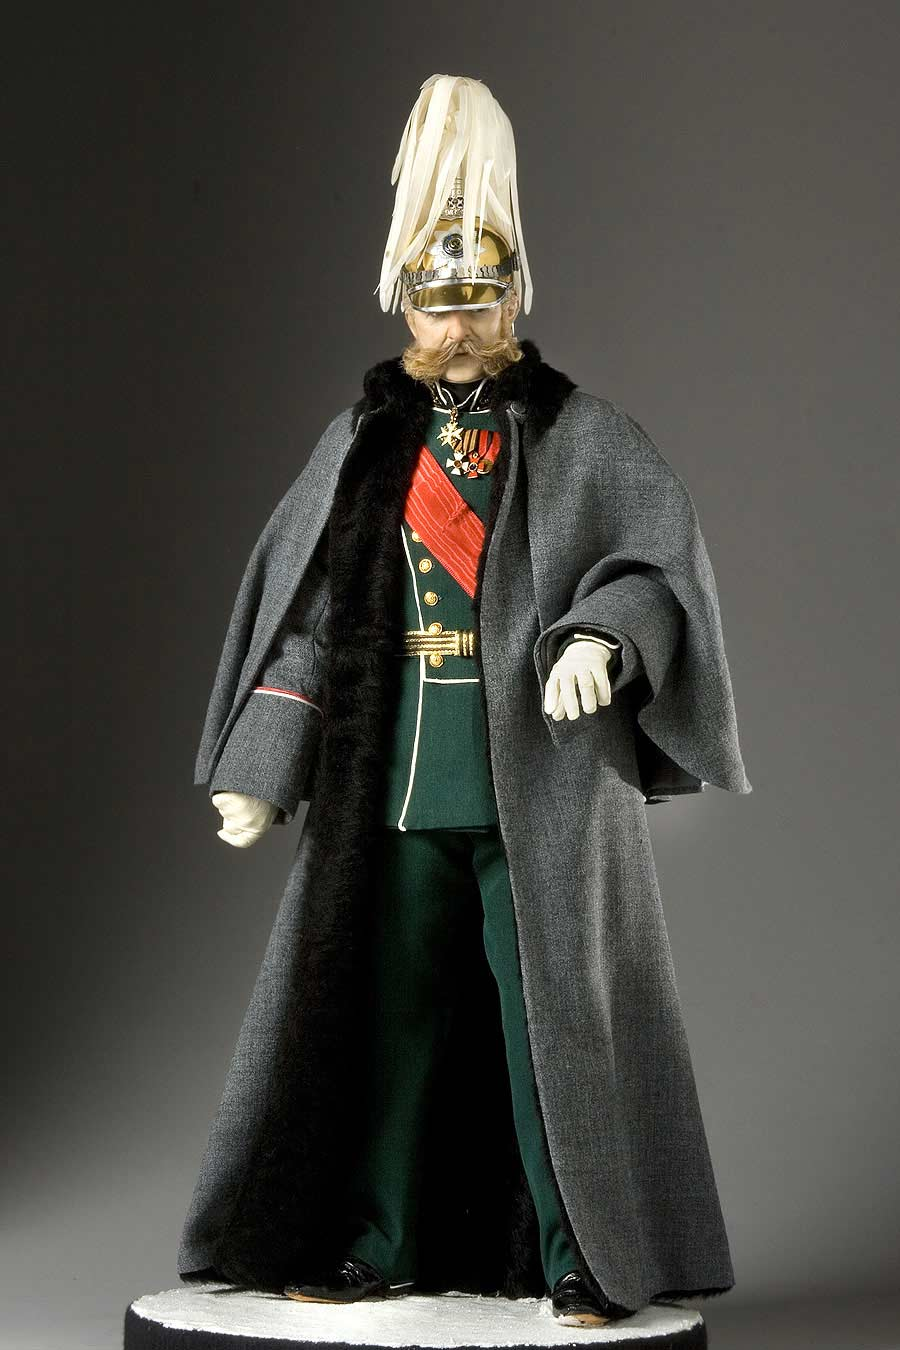 Full length color image of Alexander II Nikolaevich aka. Александр II Николаевич, Liberator of Russia, by George Stuart.